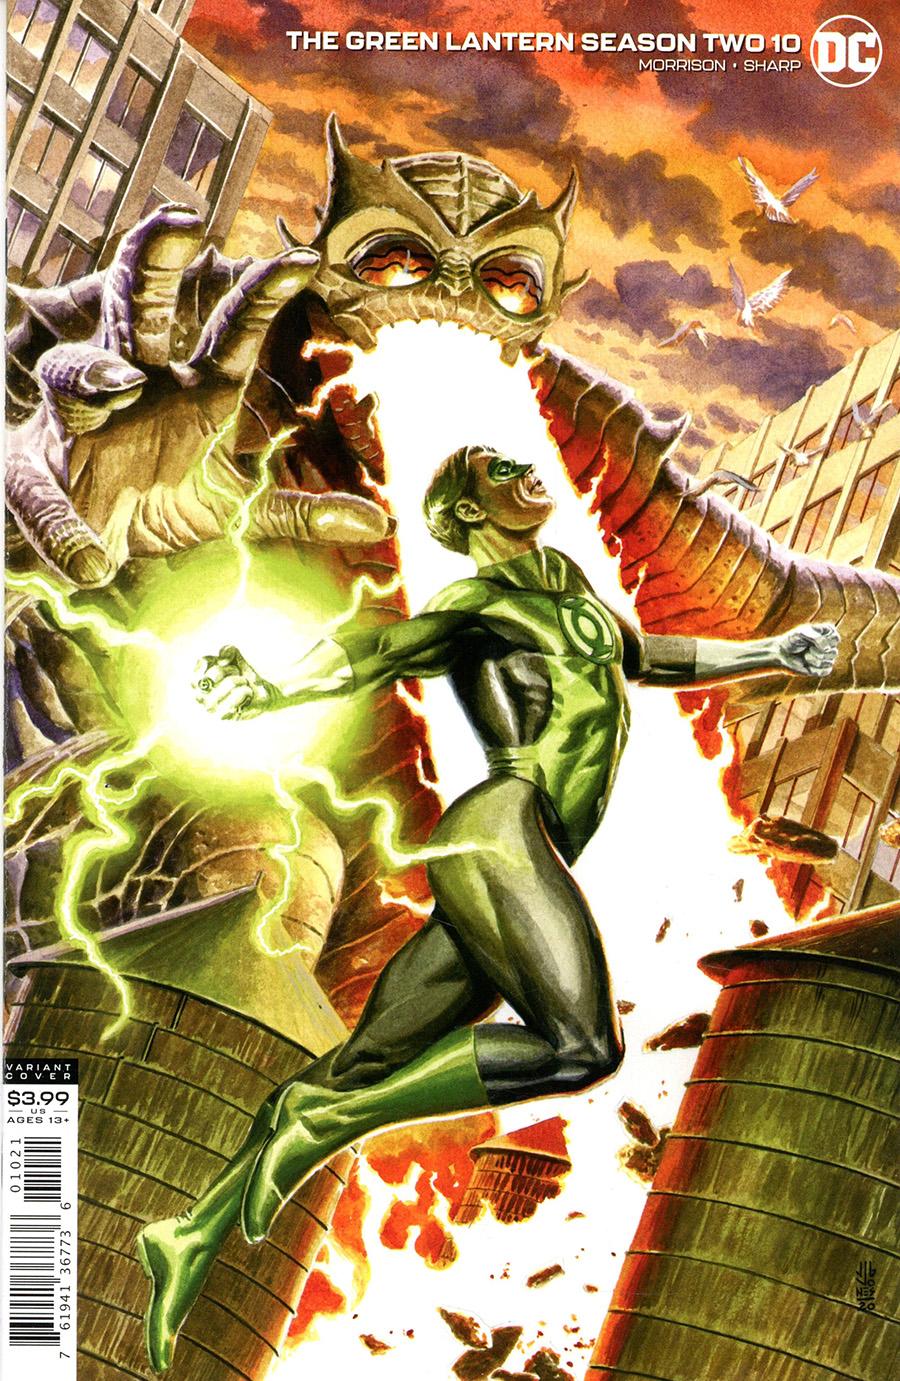 Green Lantern Vol 6 Season 2 #10 Cover B Variant JG Jones Cover